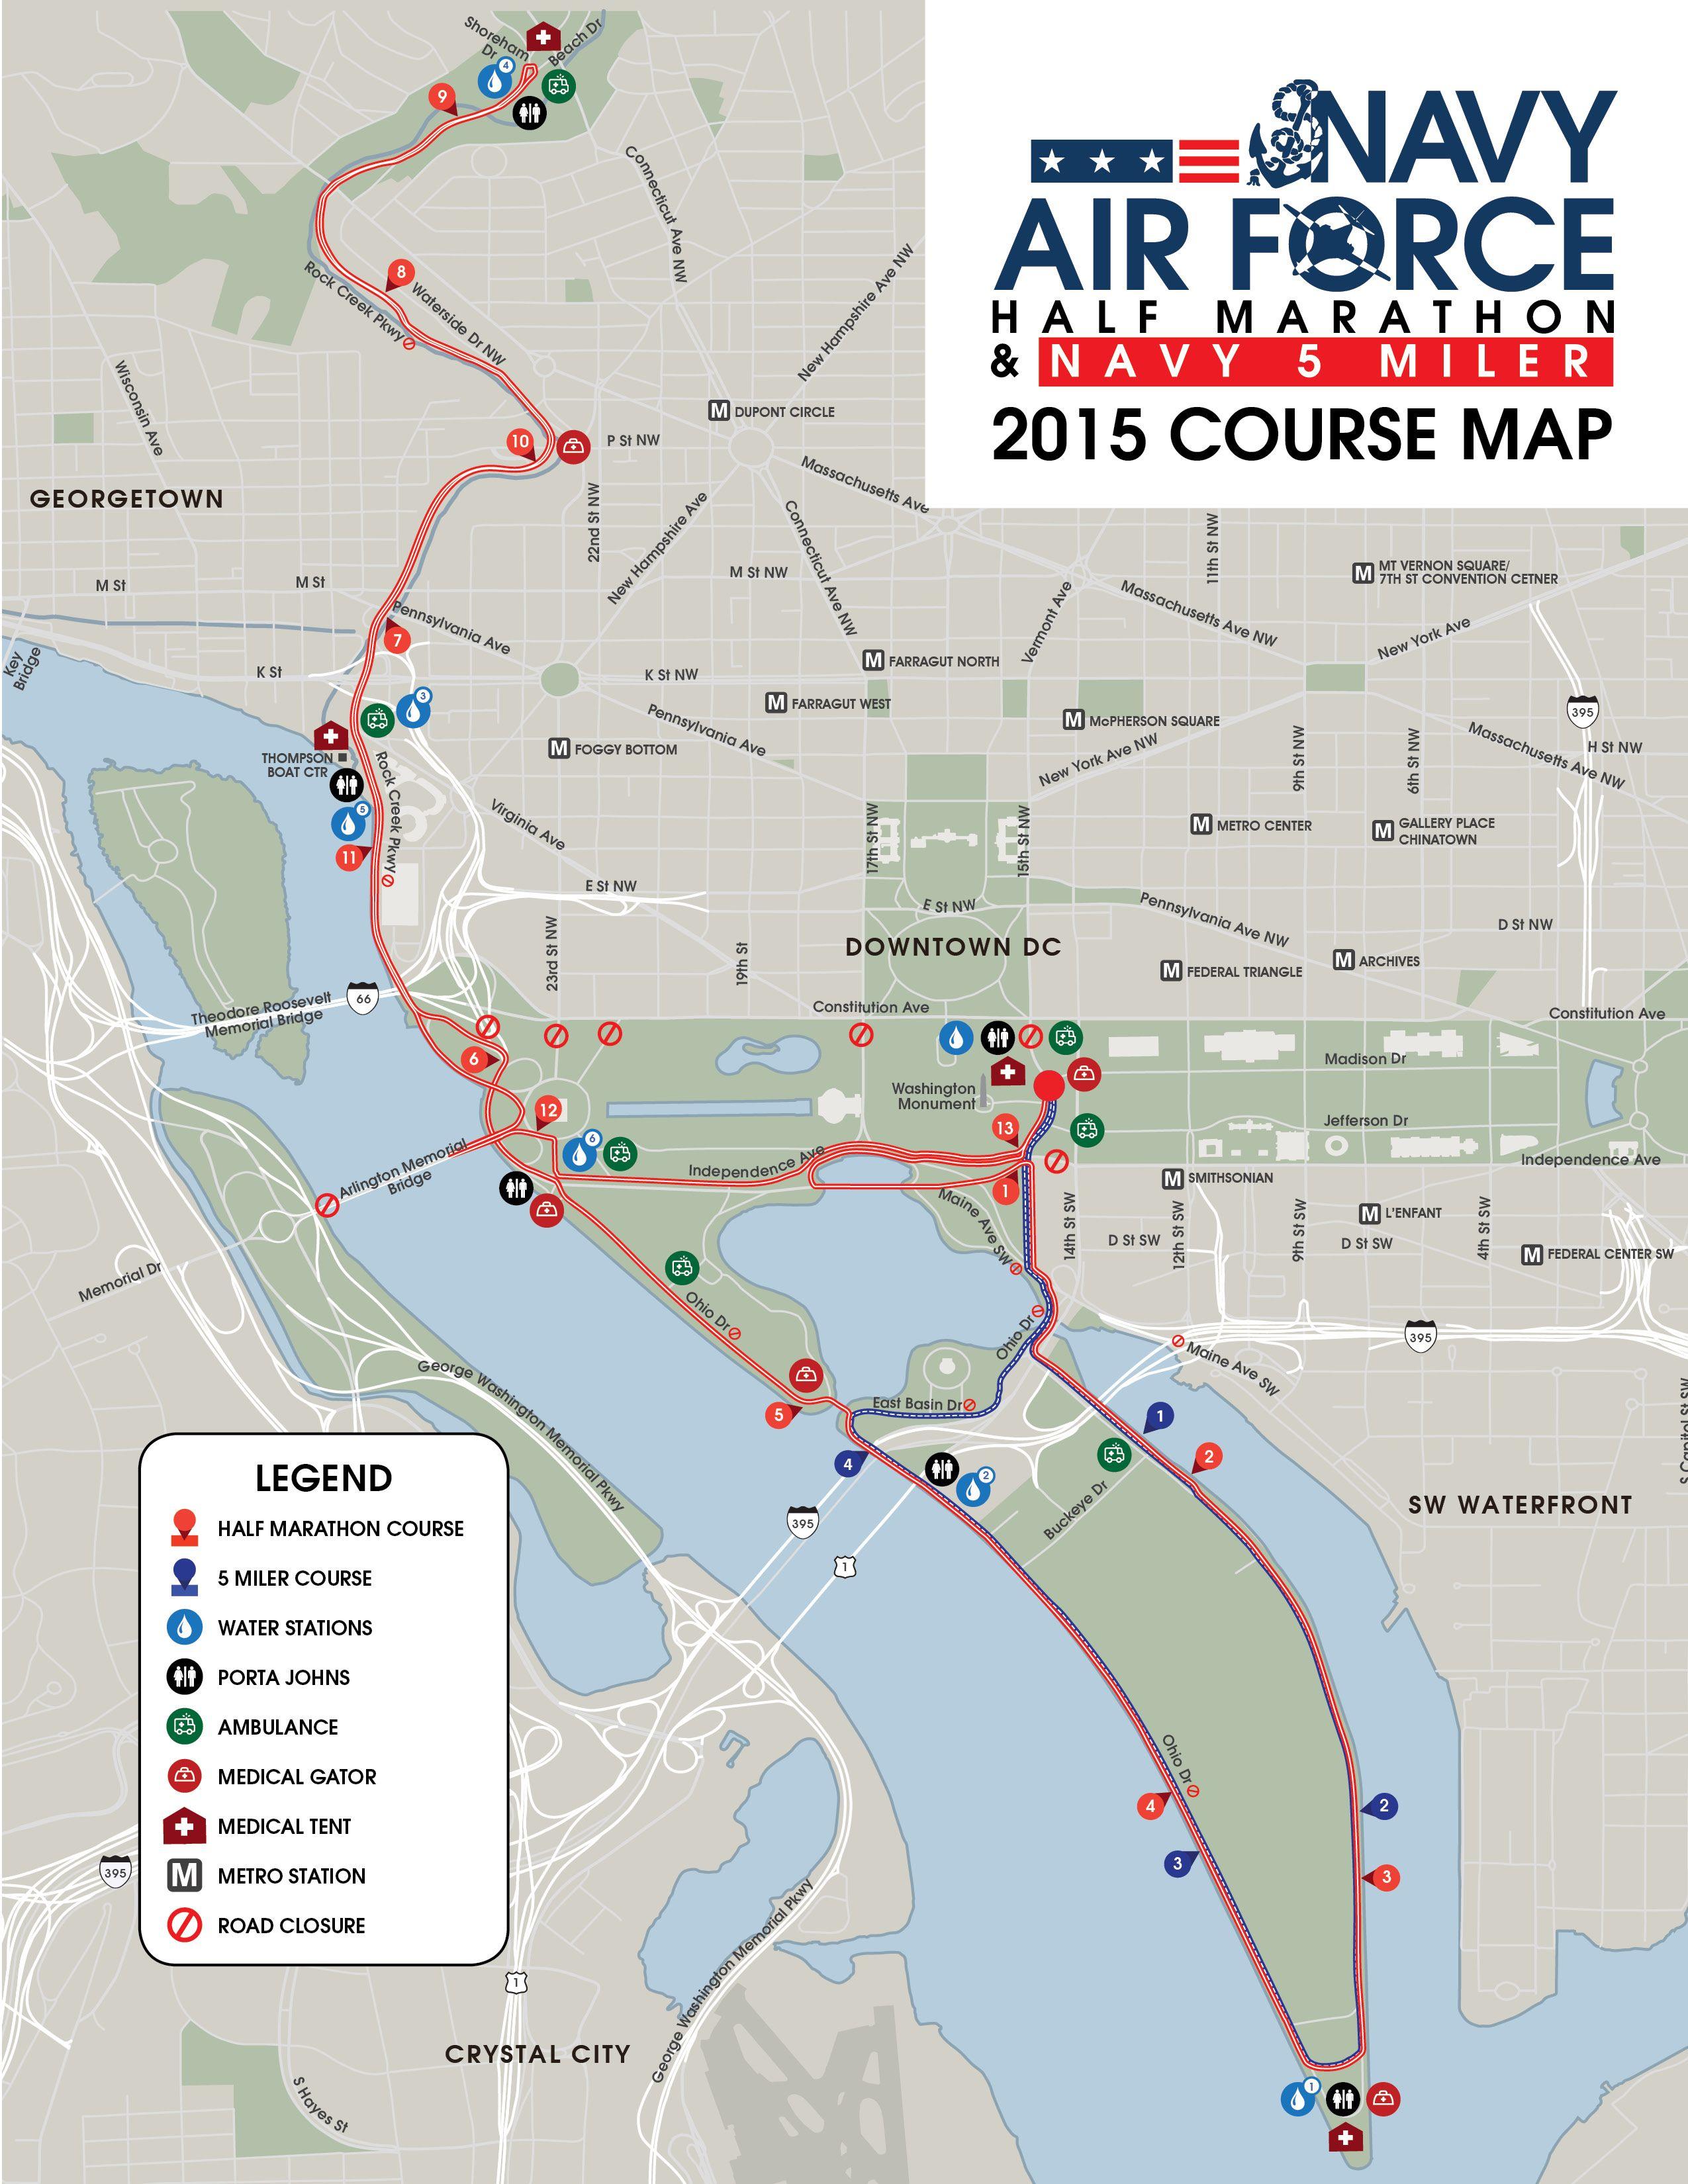 NavyAir Force Half Marathon & 5 Miler 2015 I would